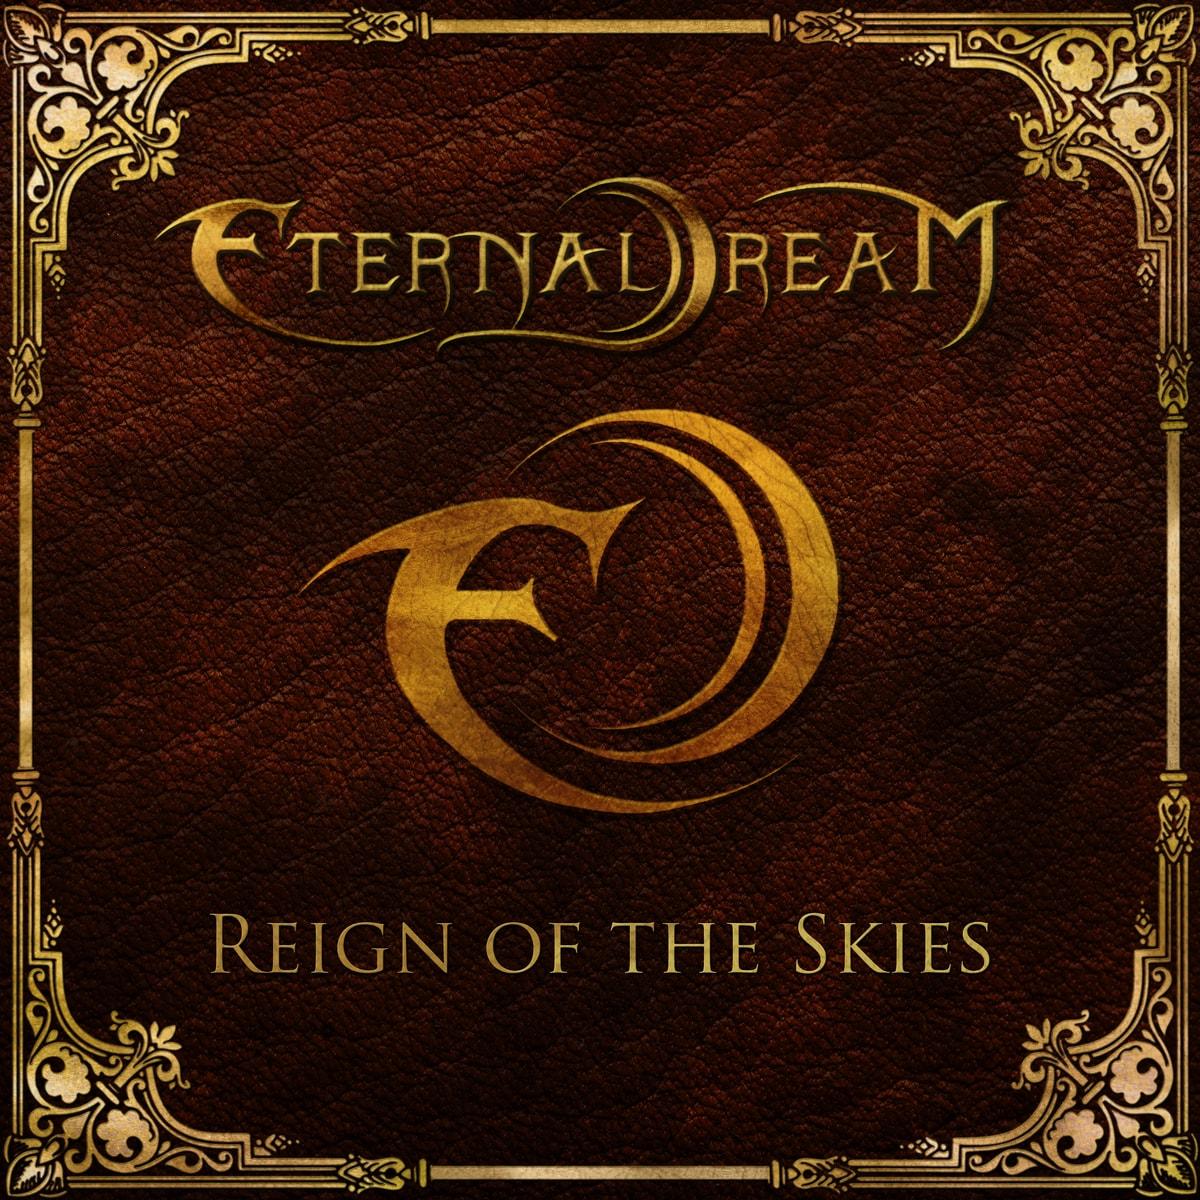 eternaldream07